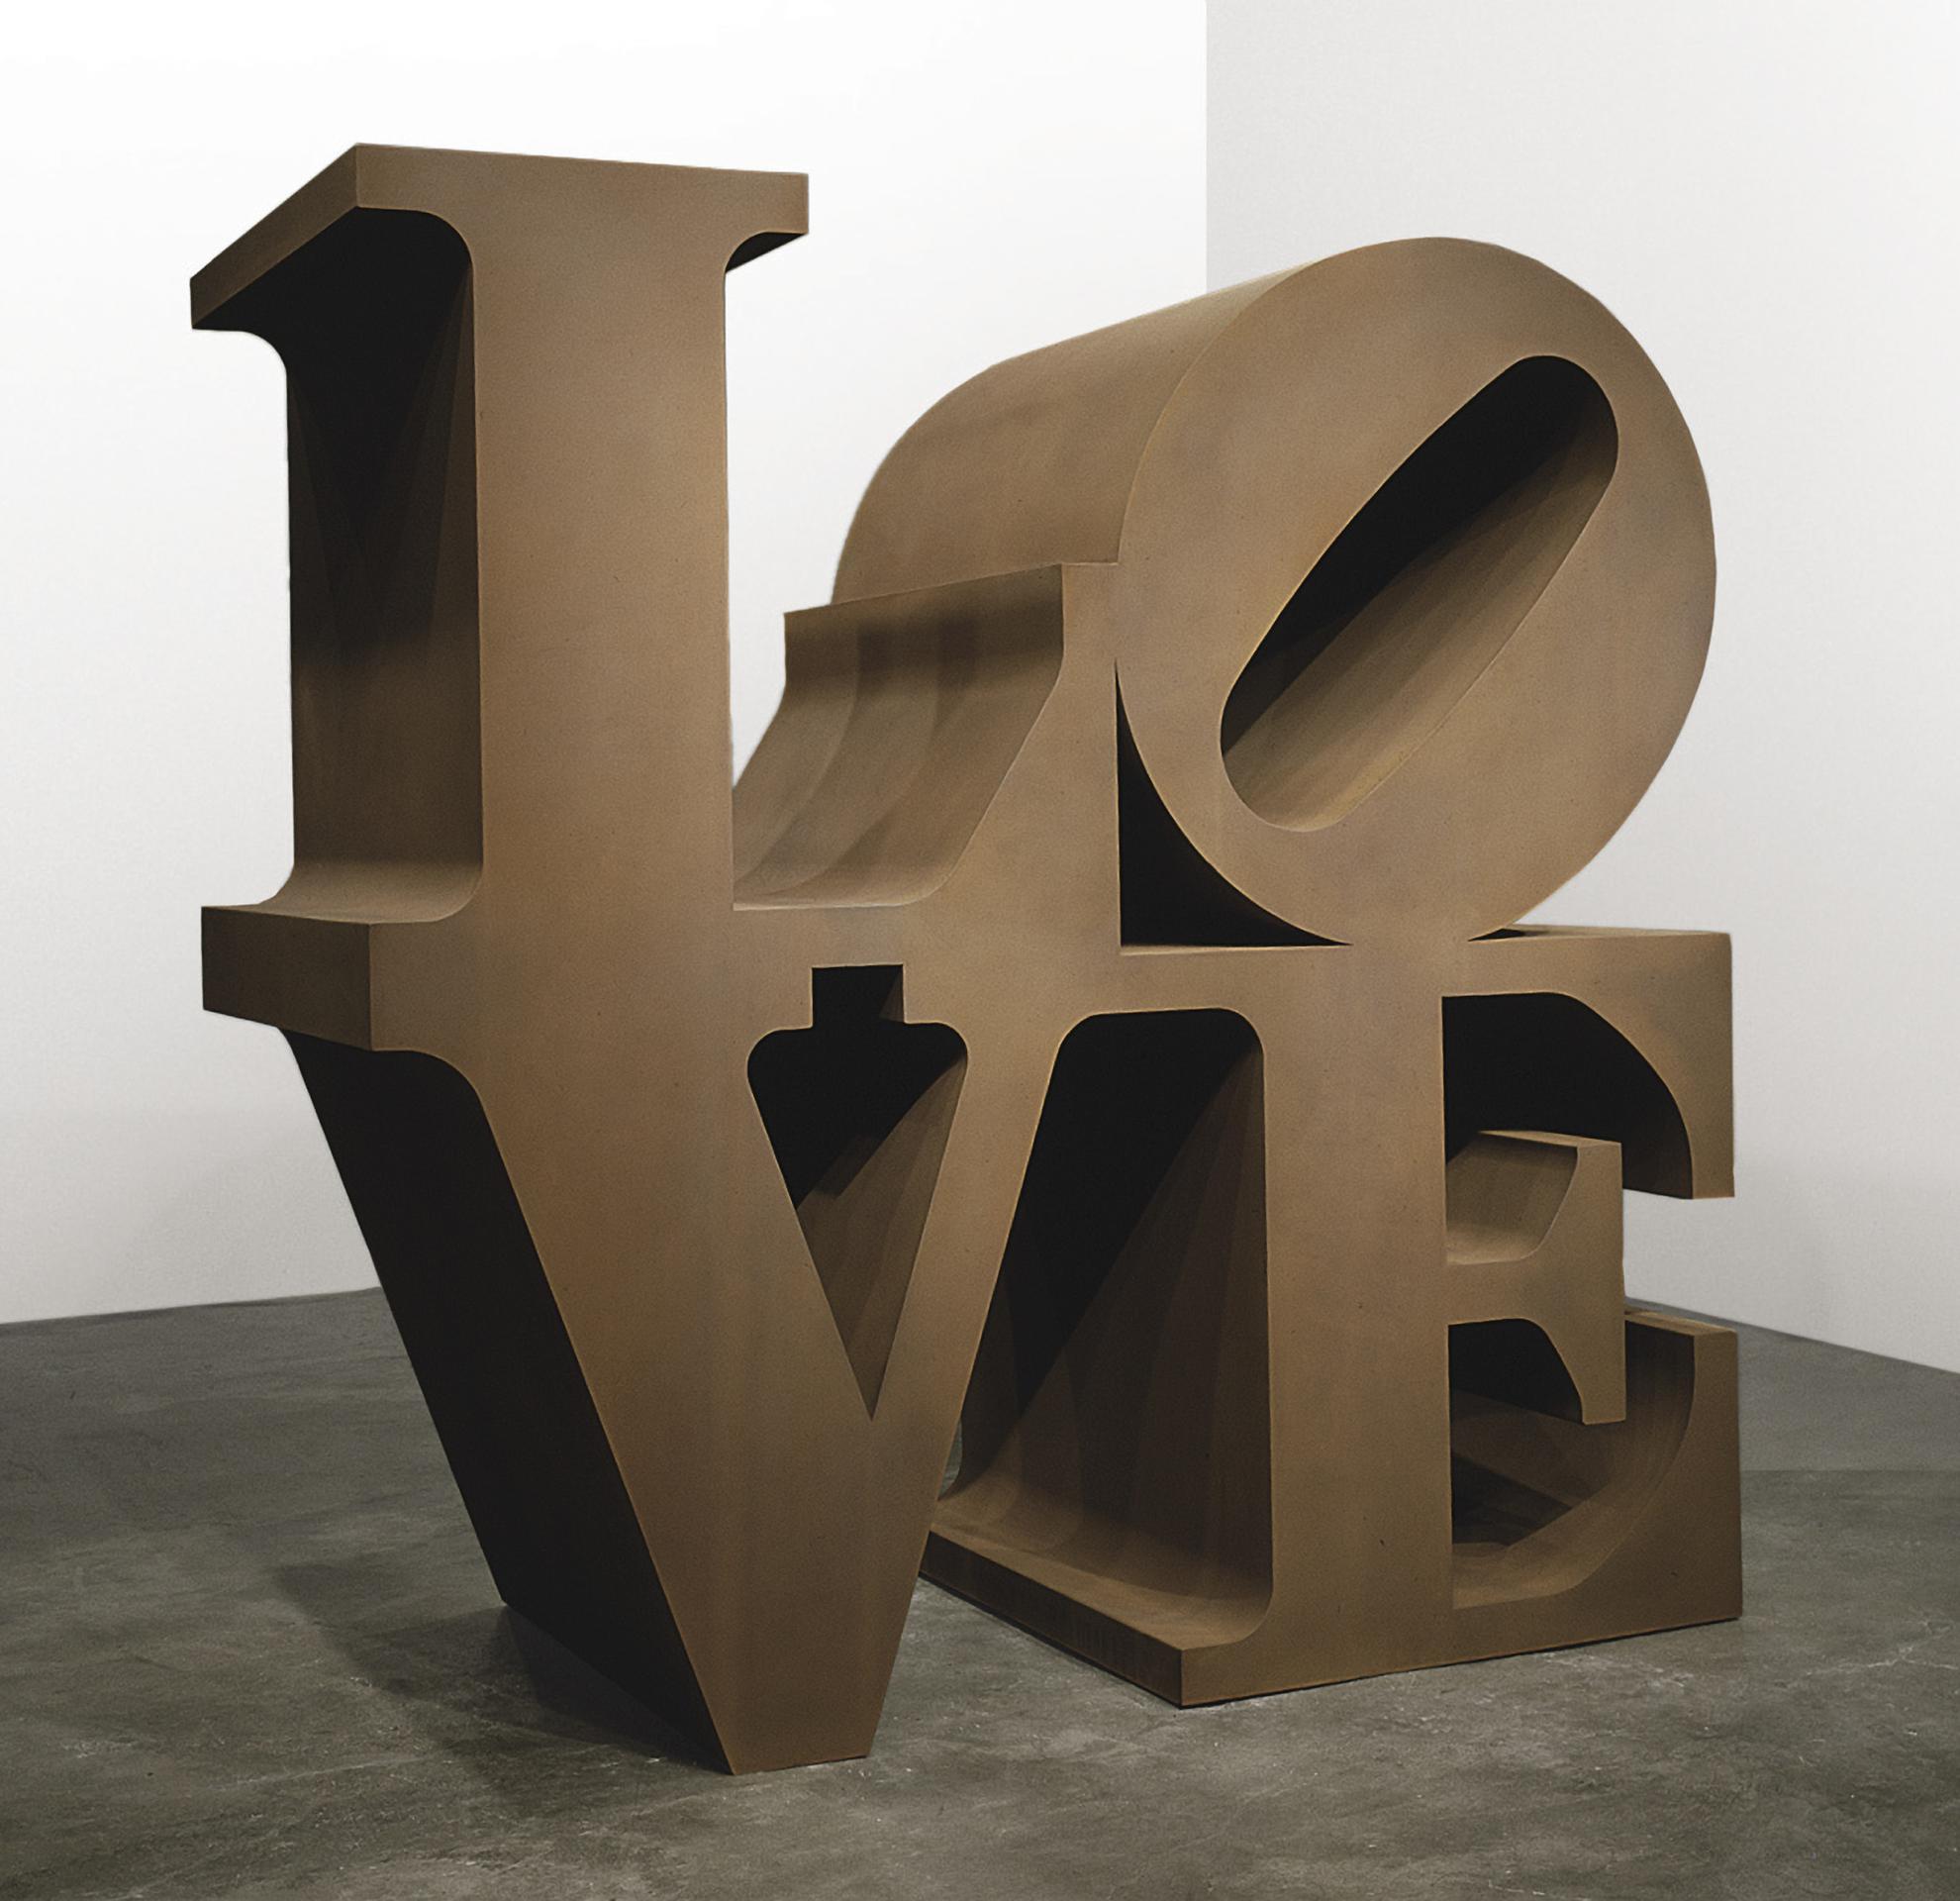 Robert Indiana-Love-1999